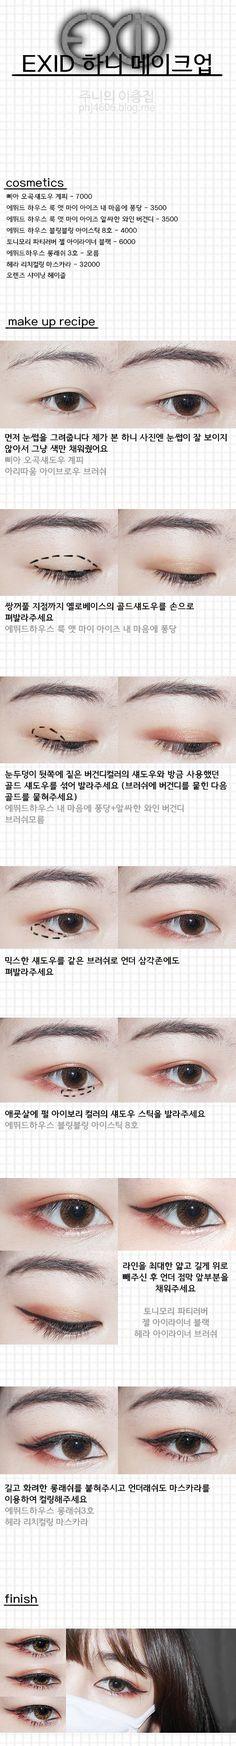 exid's hani makeup tutorial